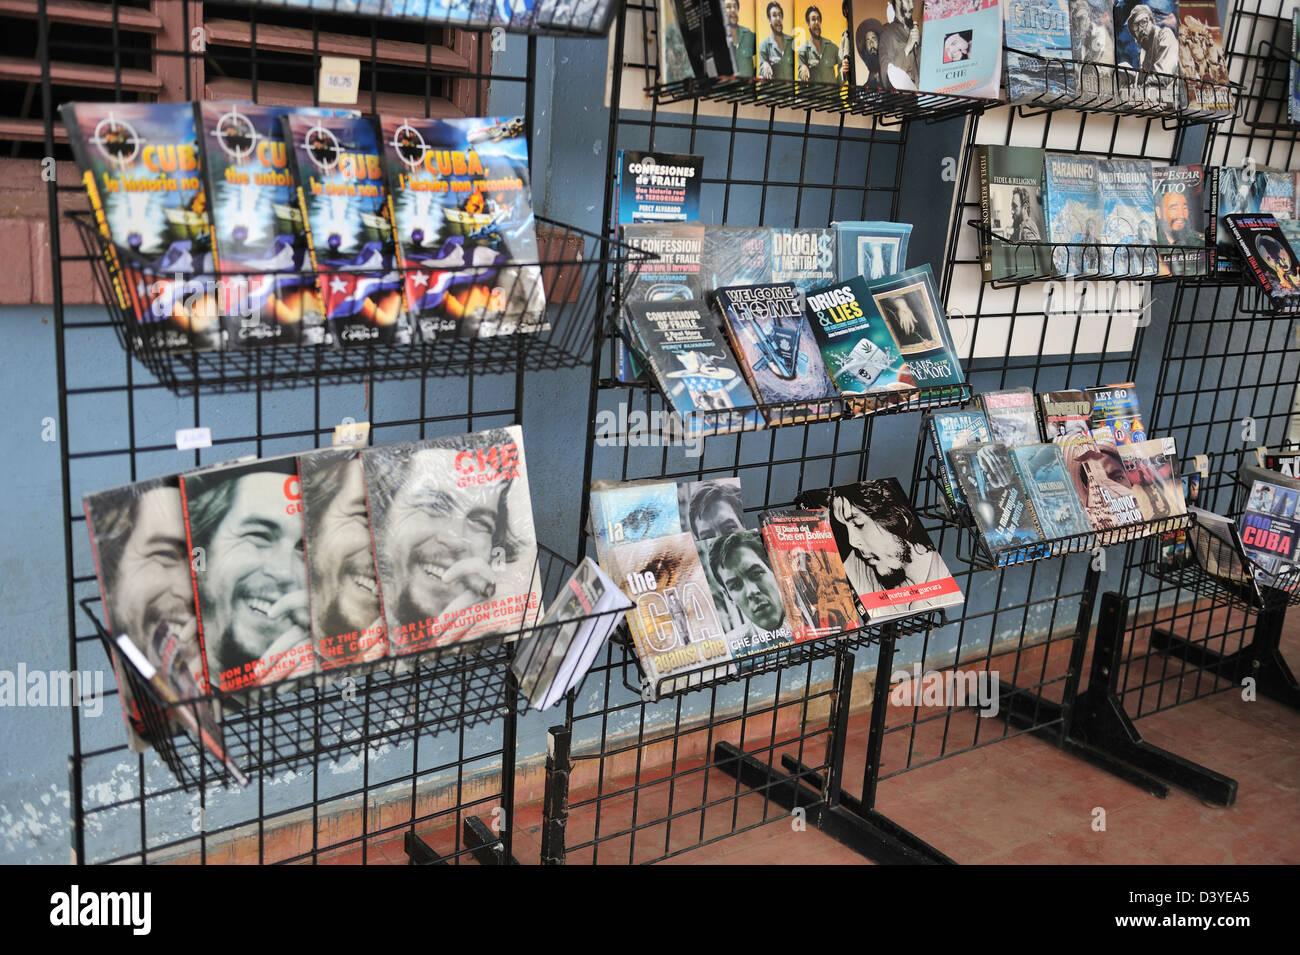 Market stand with propaganda materials, Vinales, Cuba - Stock Image